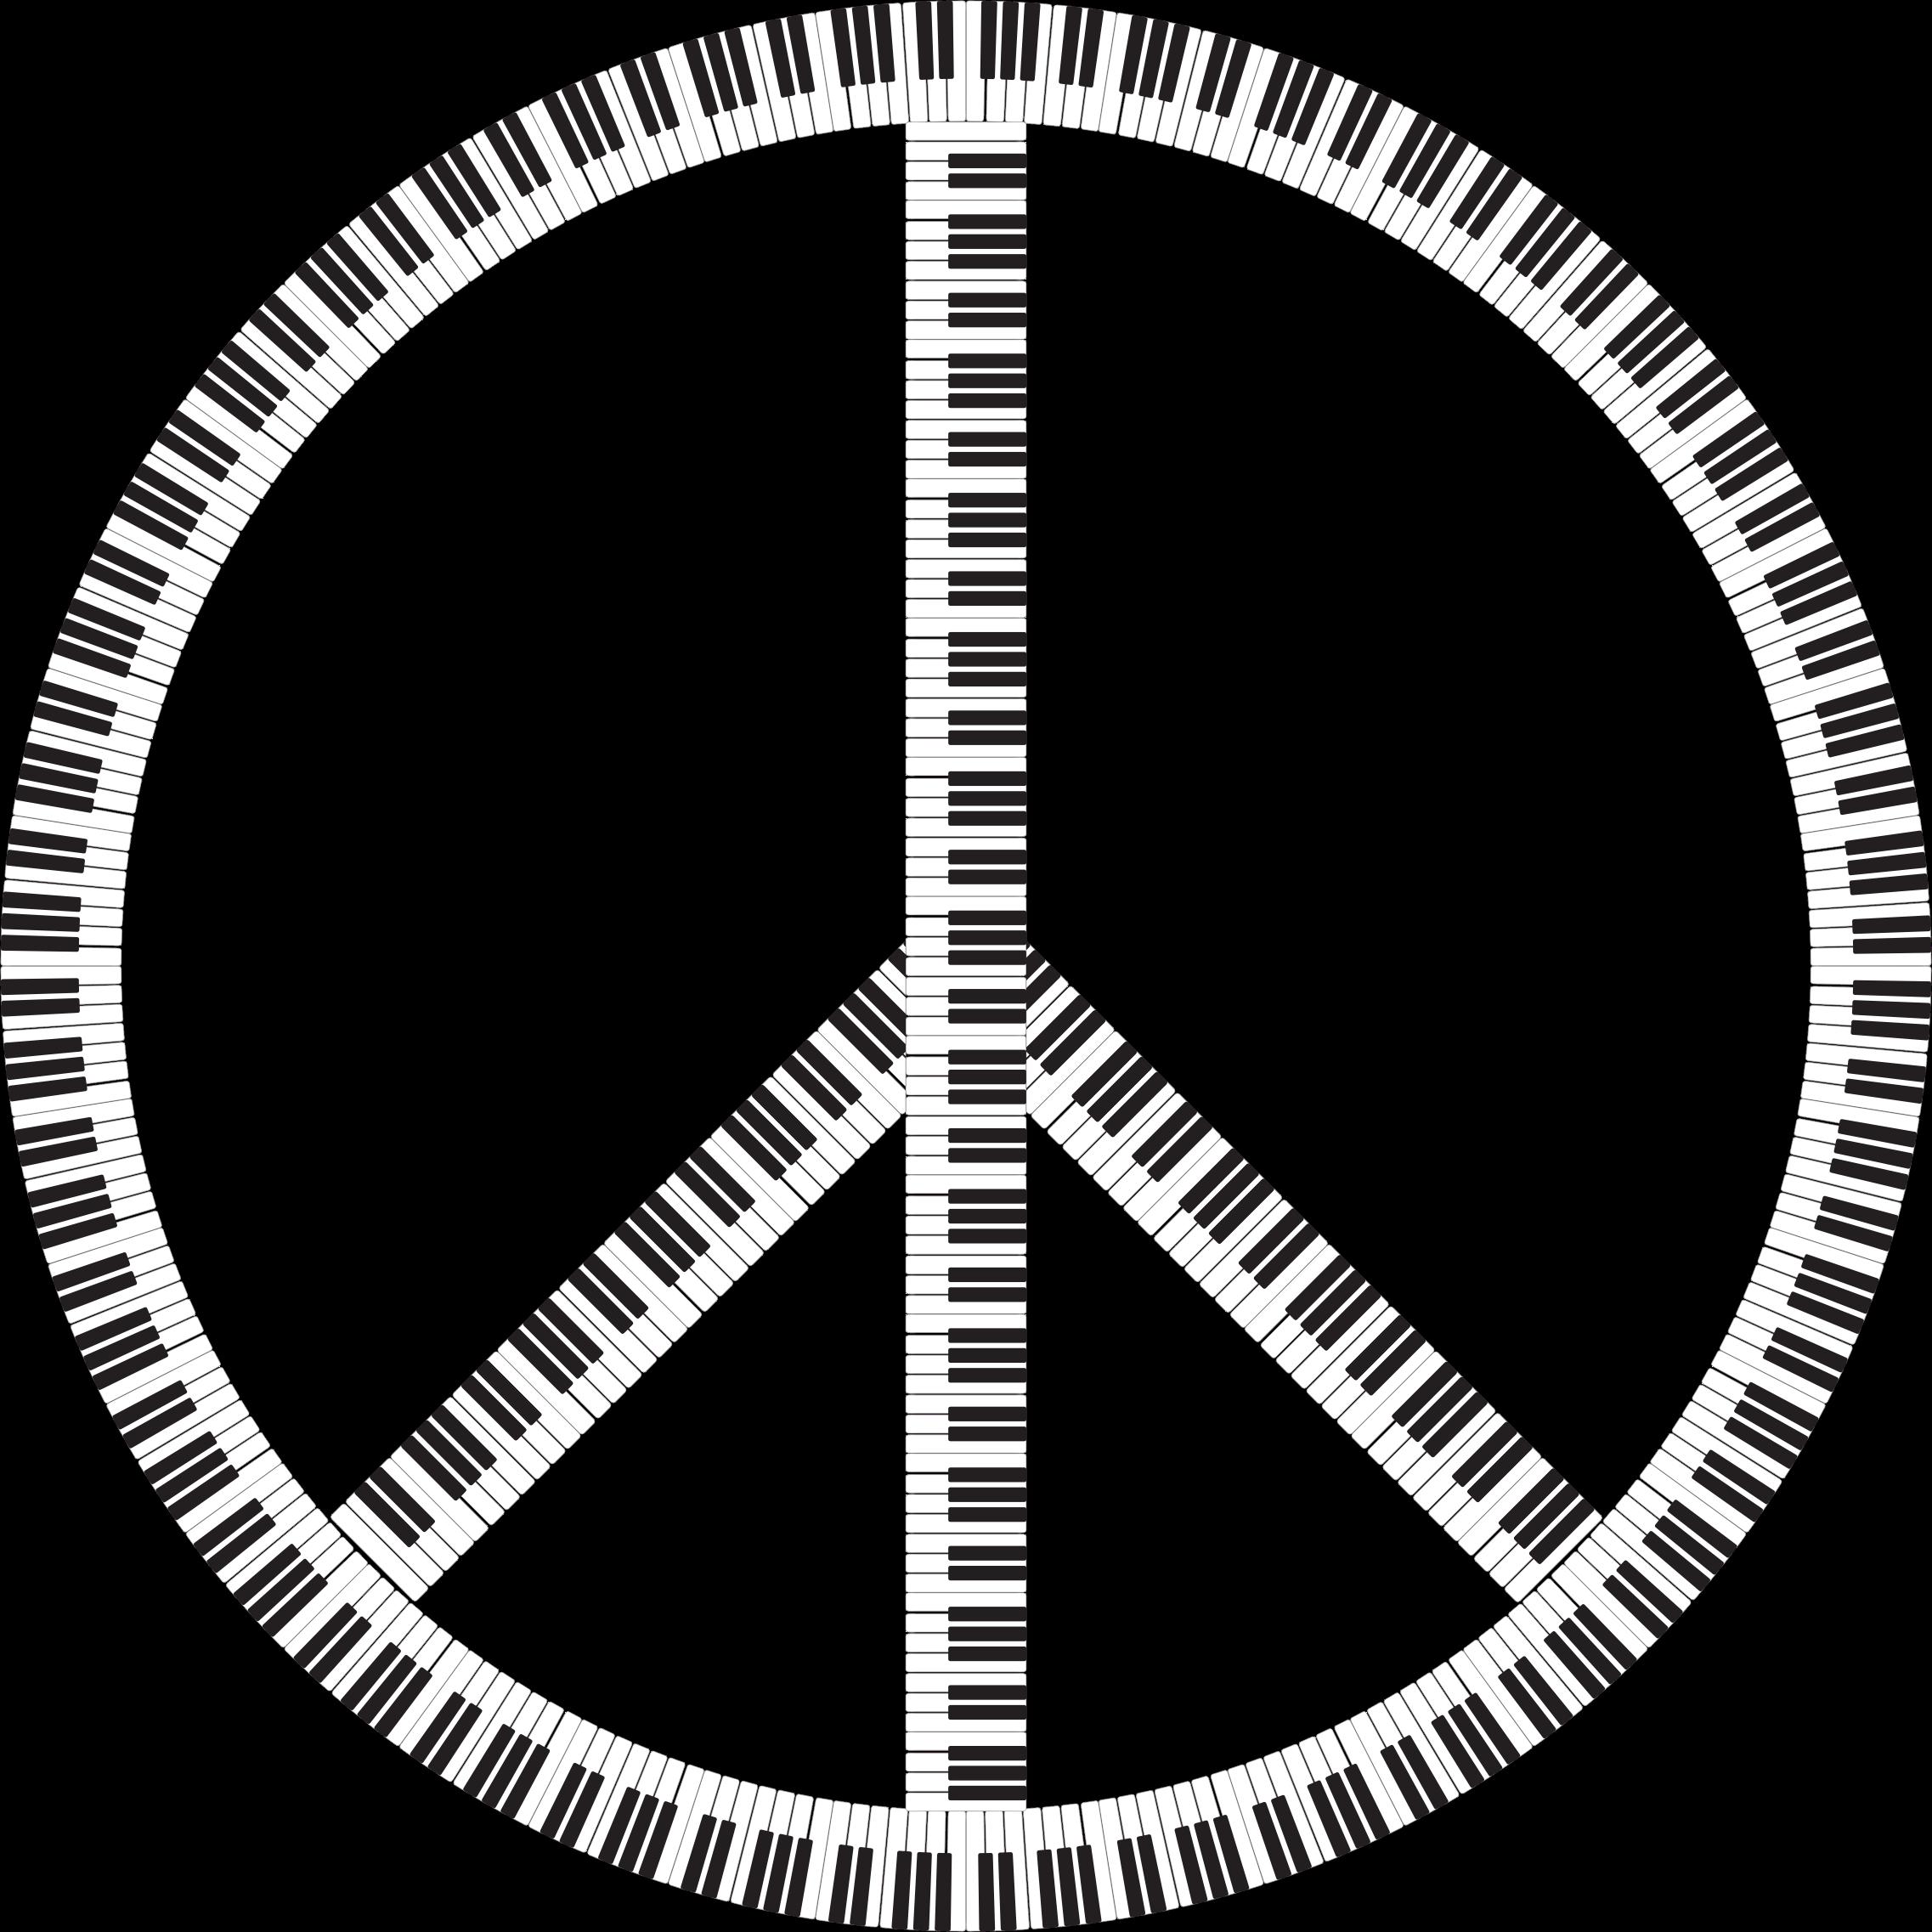 Piano clipart abstract. Peace sign keys big